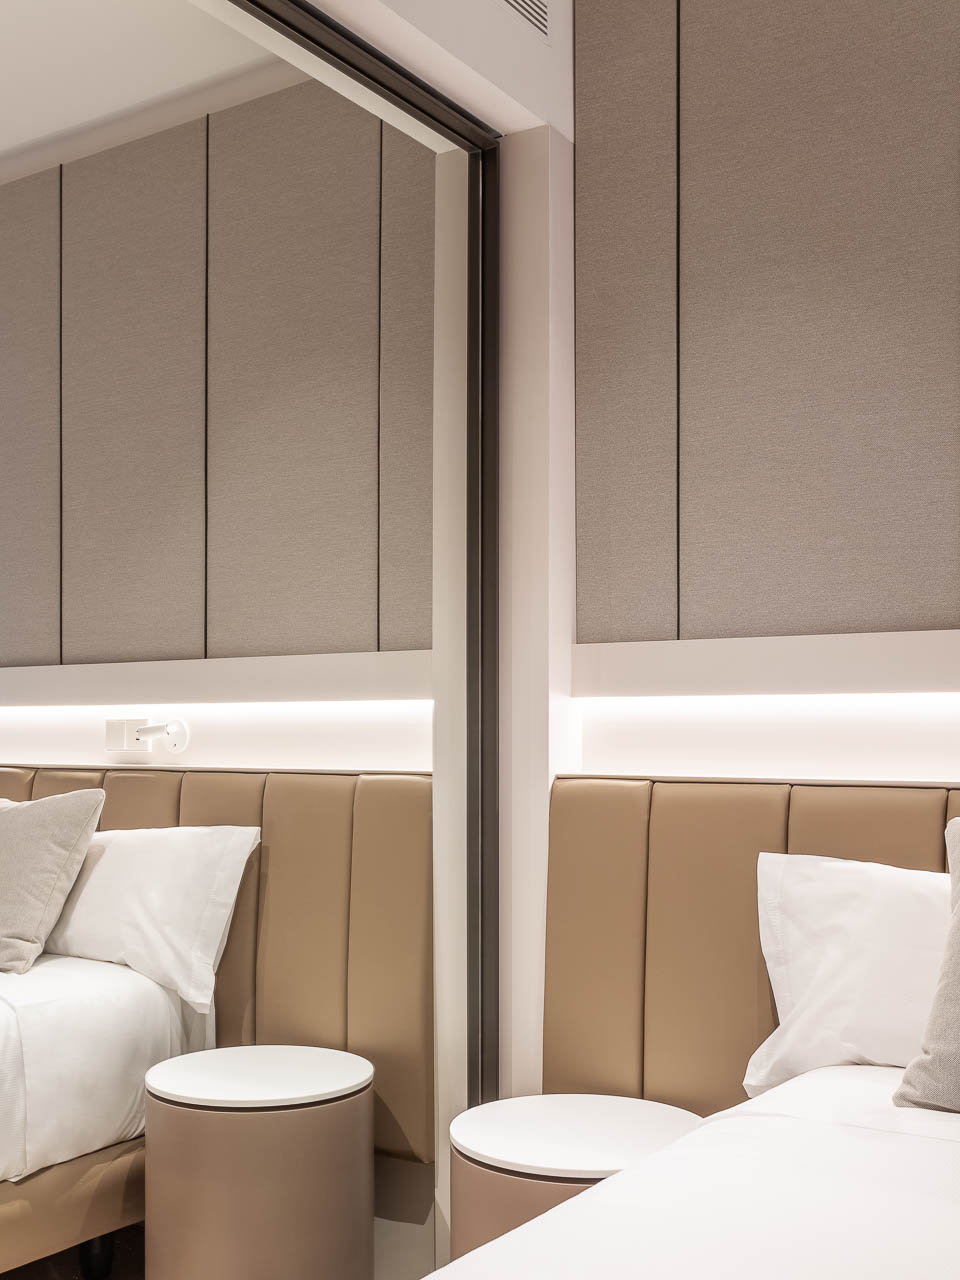 Hotel Becquer - Giordano Baly Arquitecto     Manolo Espaliú - Fotografía de Arquitectura